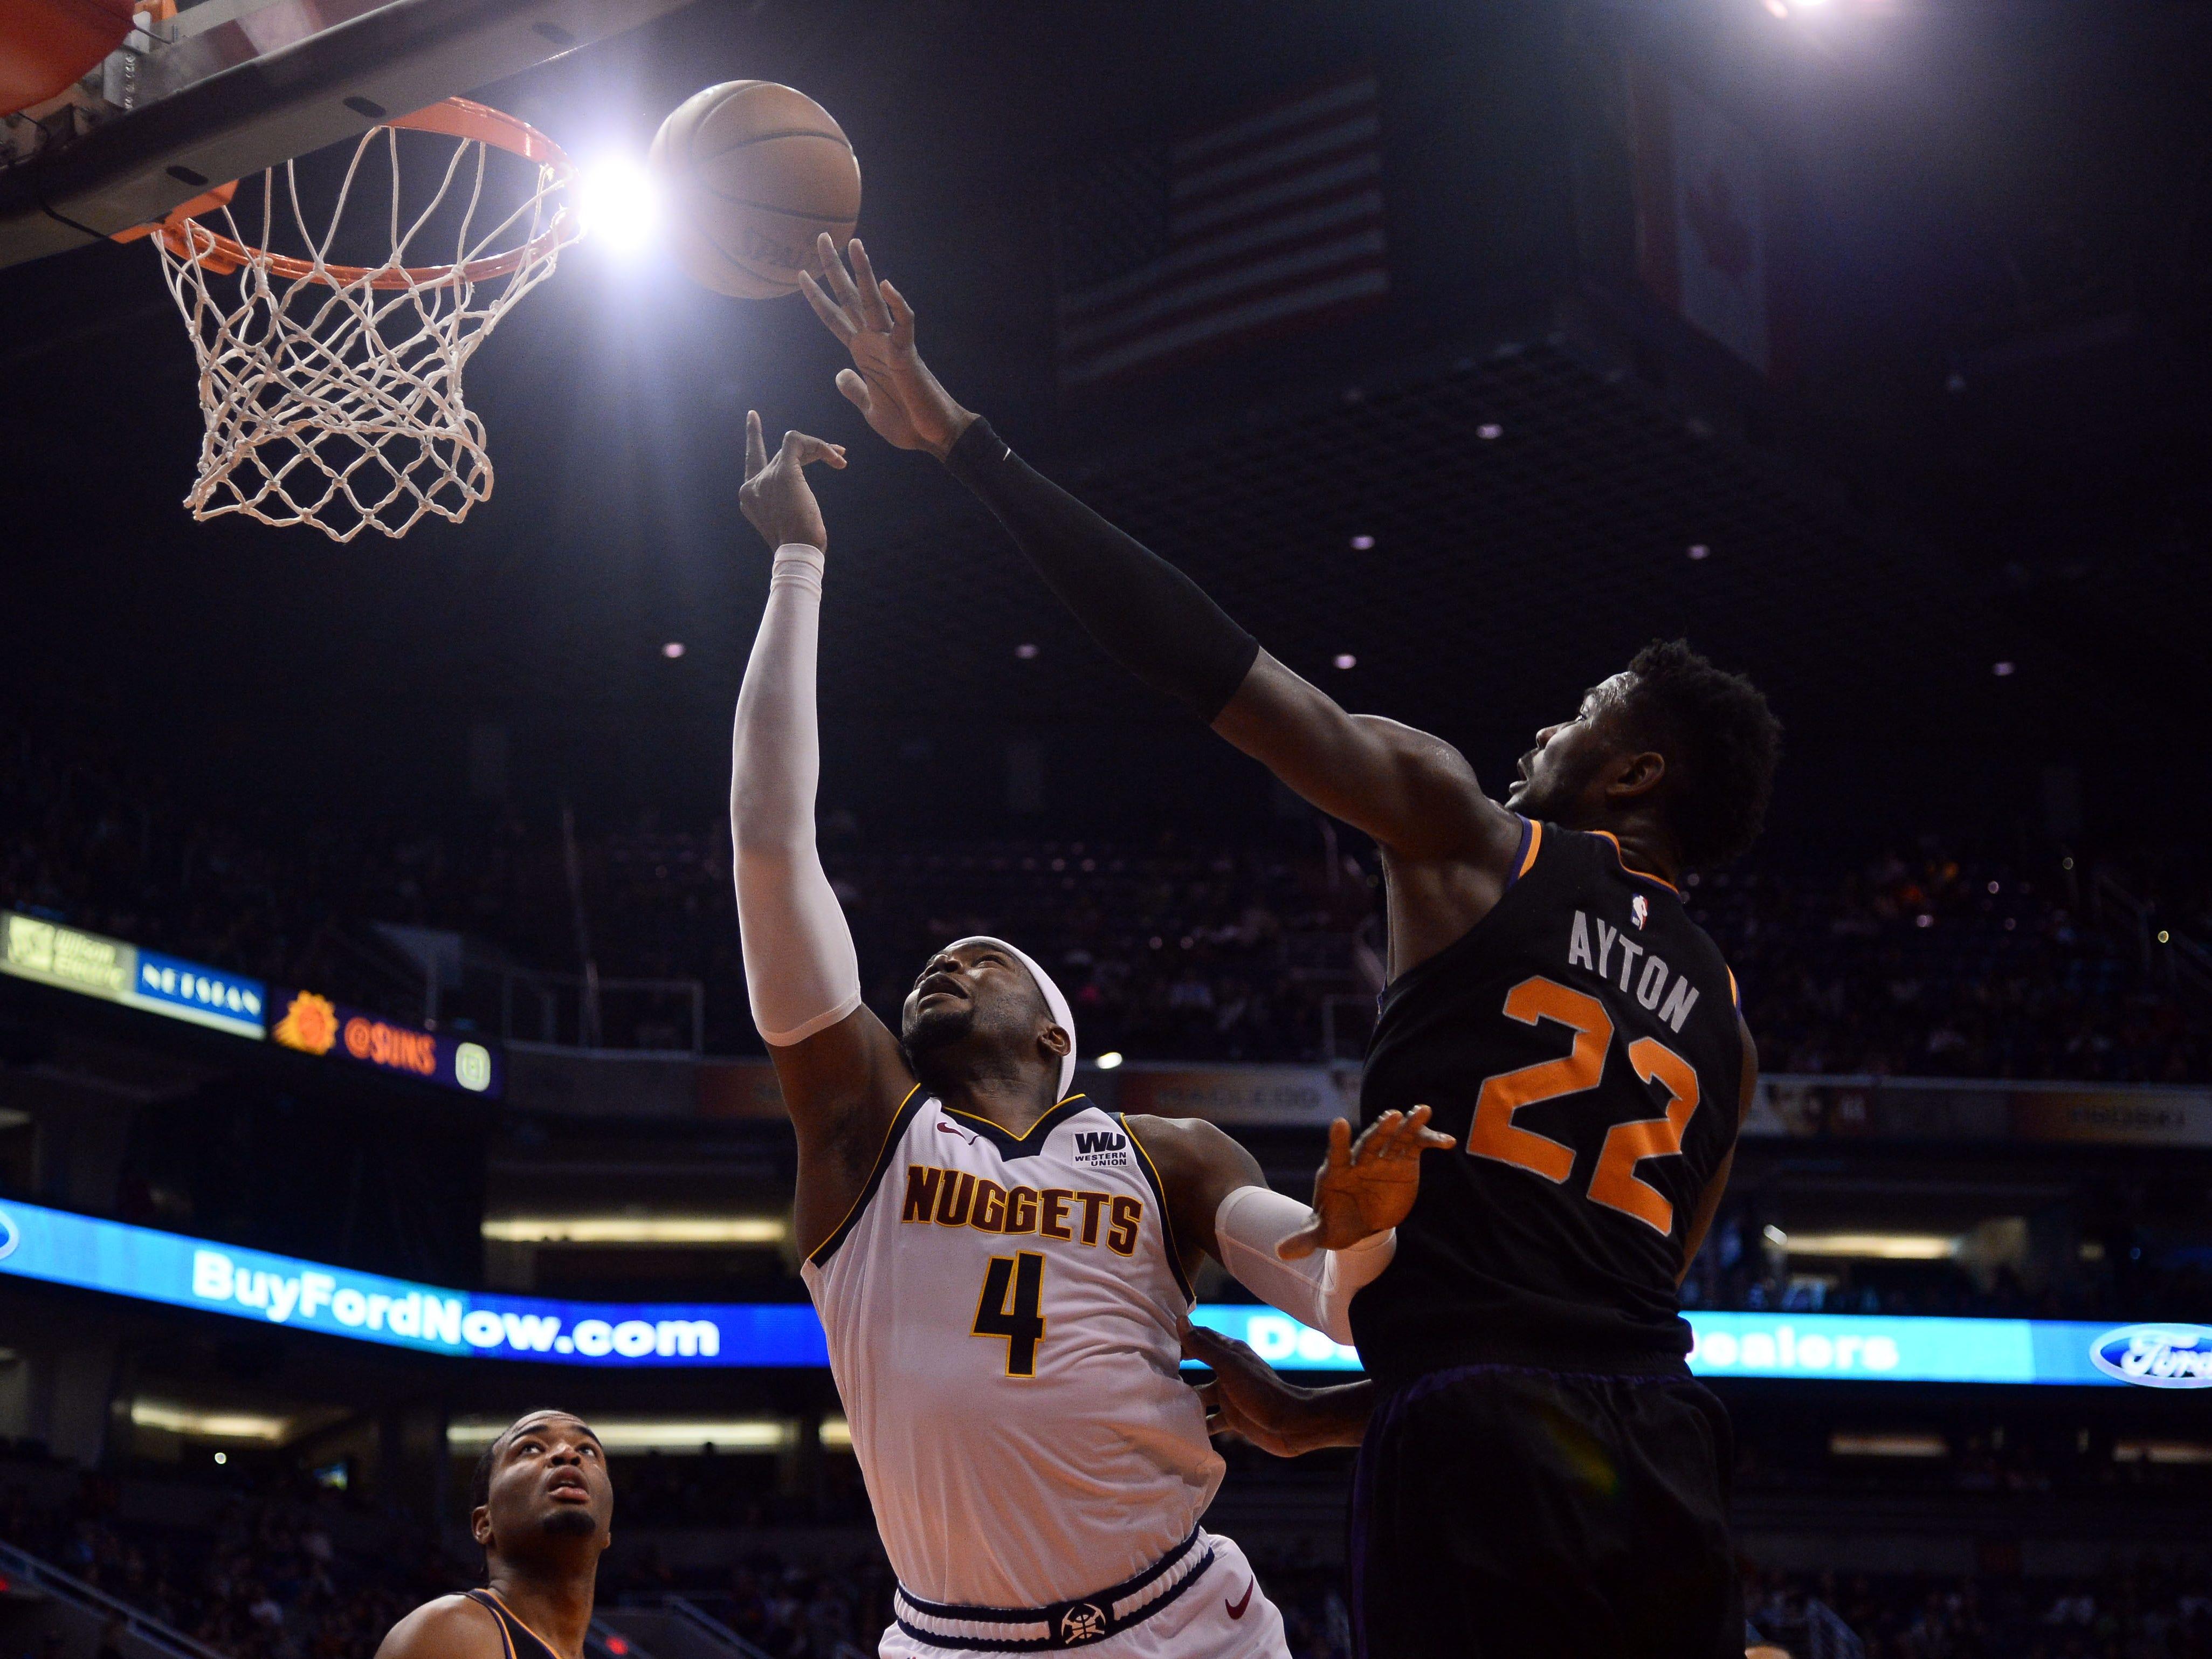 Jan 12, 2019; Phoenix, AZ, USA; Phoenix Suns center Deandre Ayton (22) blocks a shot by Denver Nuggets forward Paul Millsap (4) during the second half at Talking Stick Resort Arena. (Joe Camporeale-USA TODAY Sports)